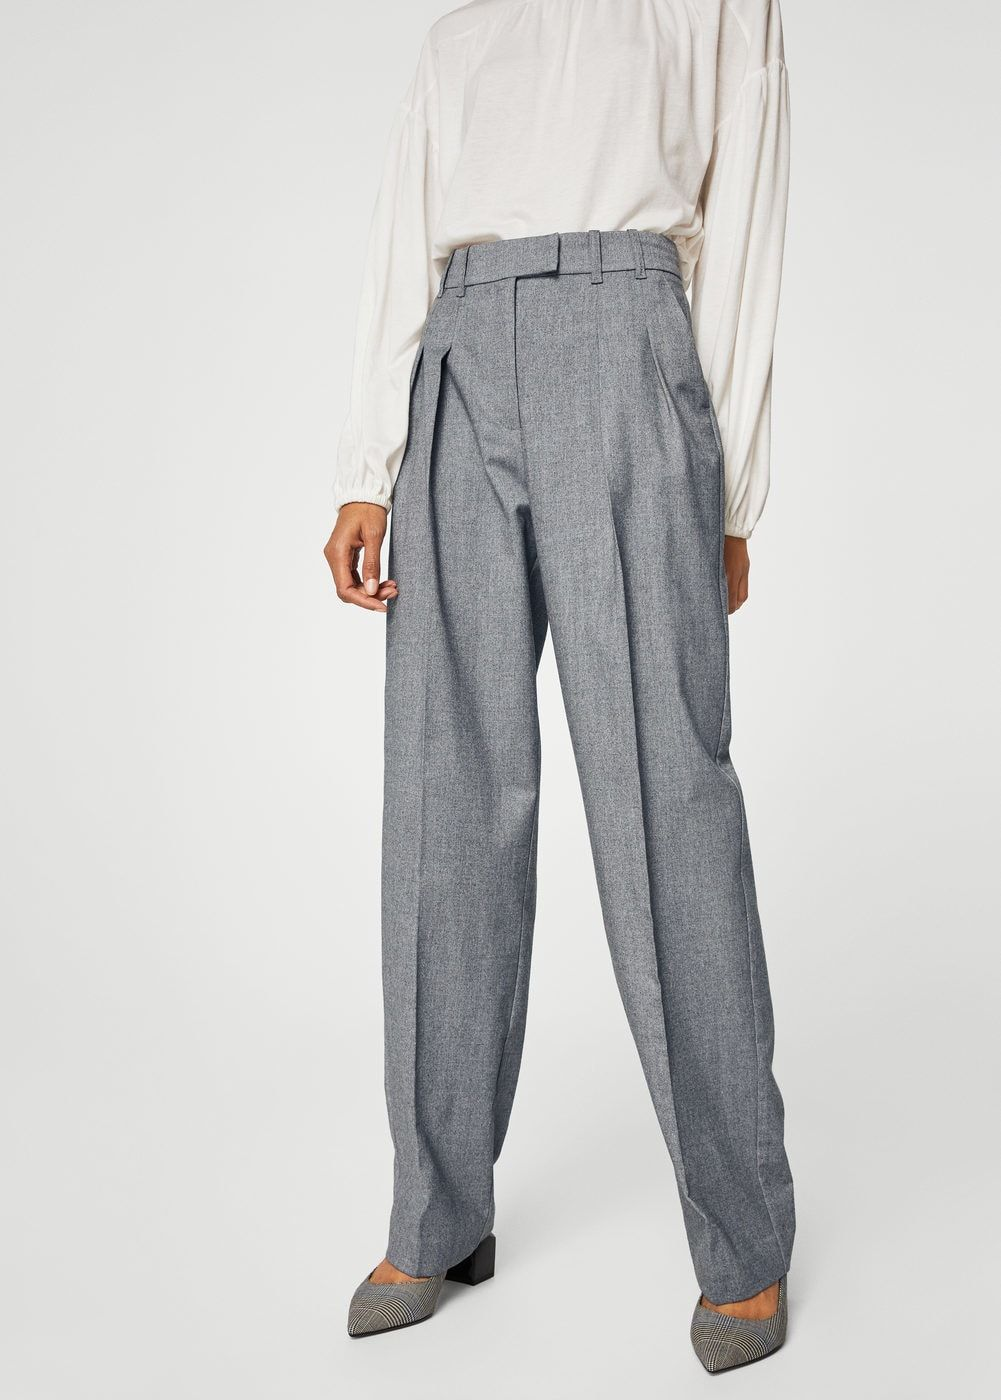 Pantalón detalle pinzas - Pantalones de Mujer  df53a9ae1919